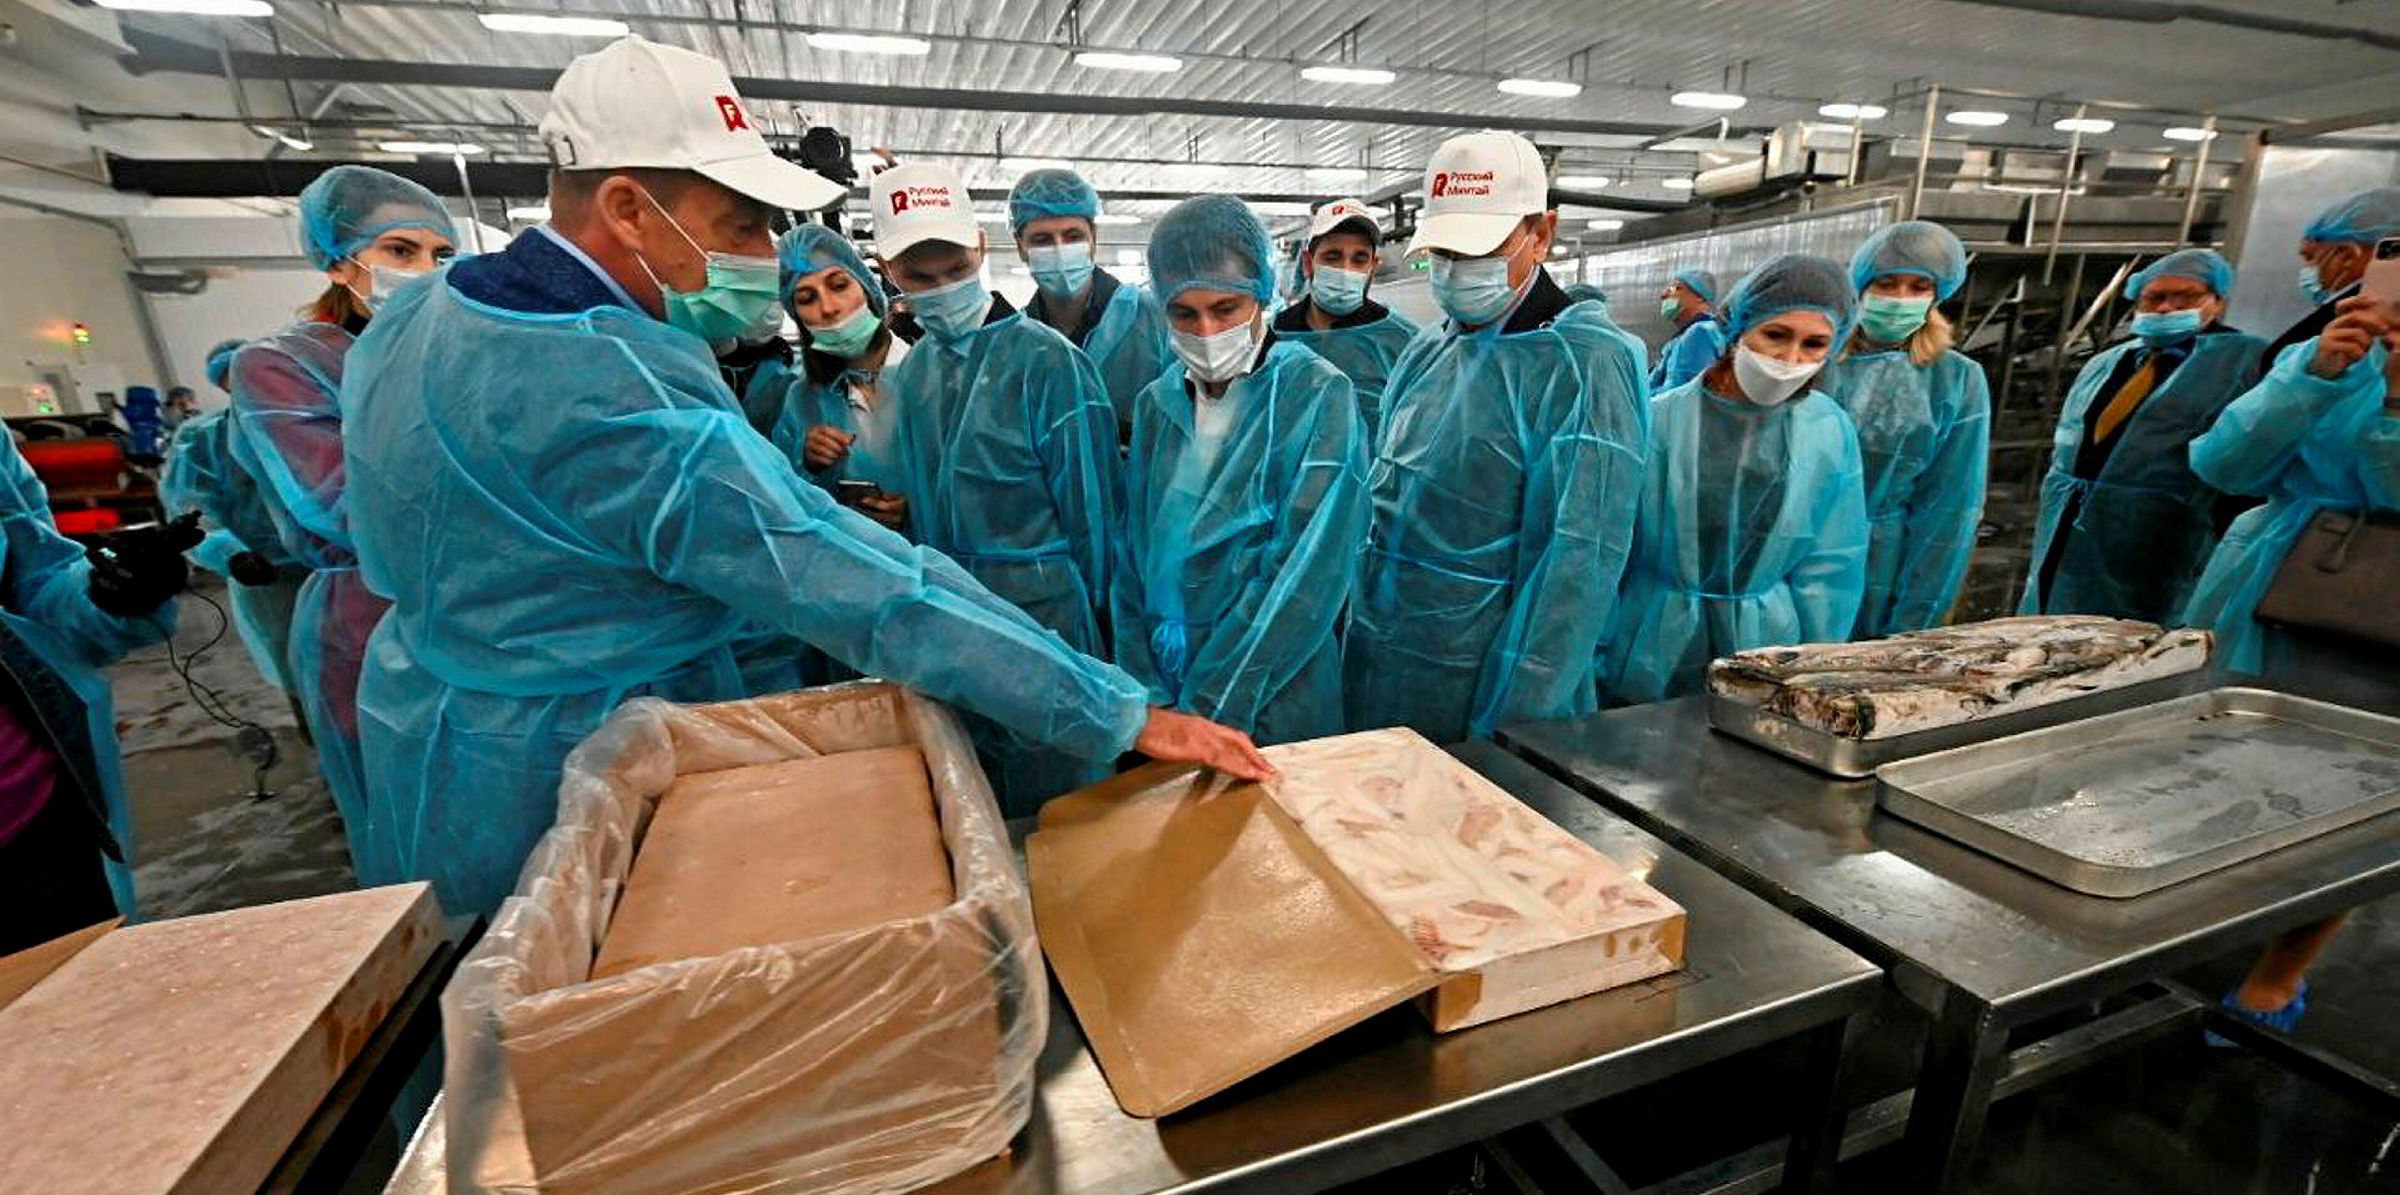 WATCH: Russian Fishery Company kicks off production at Far East pollock facility   Intrafish